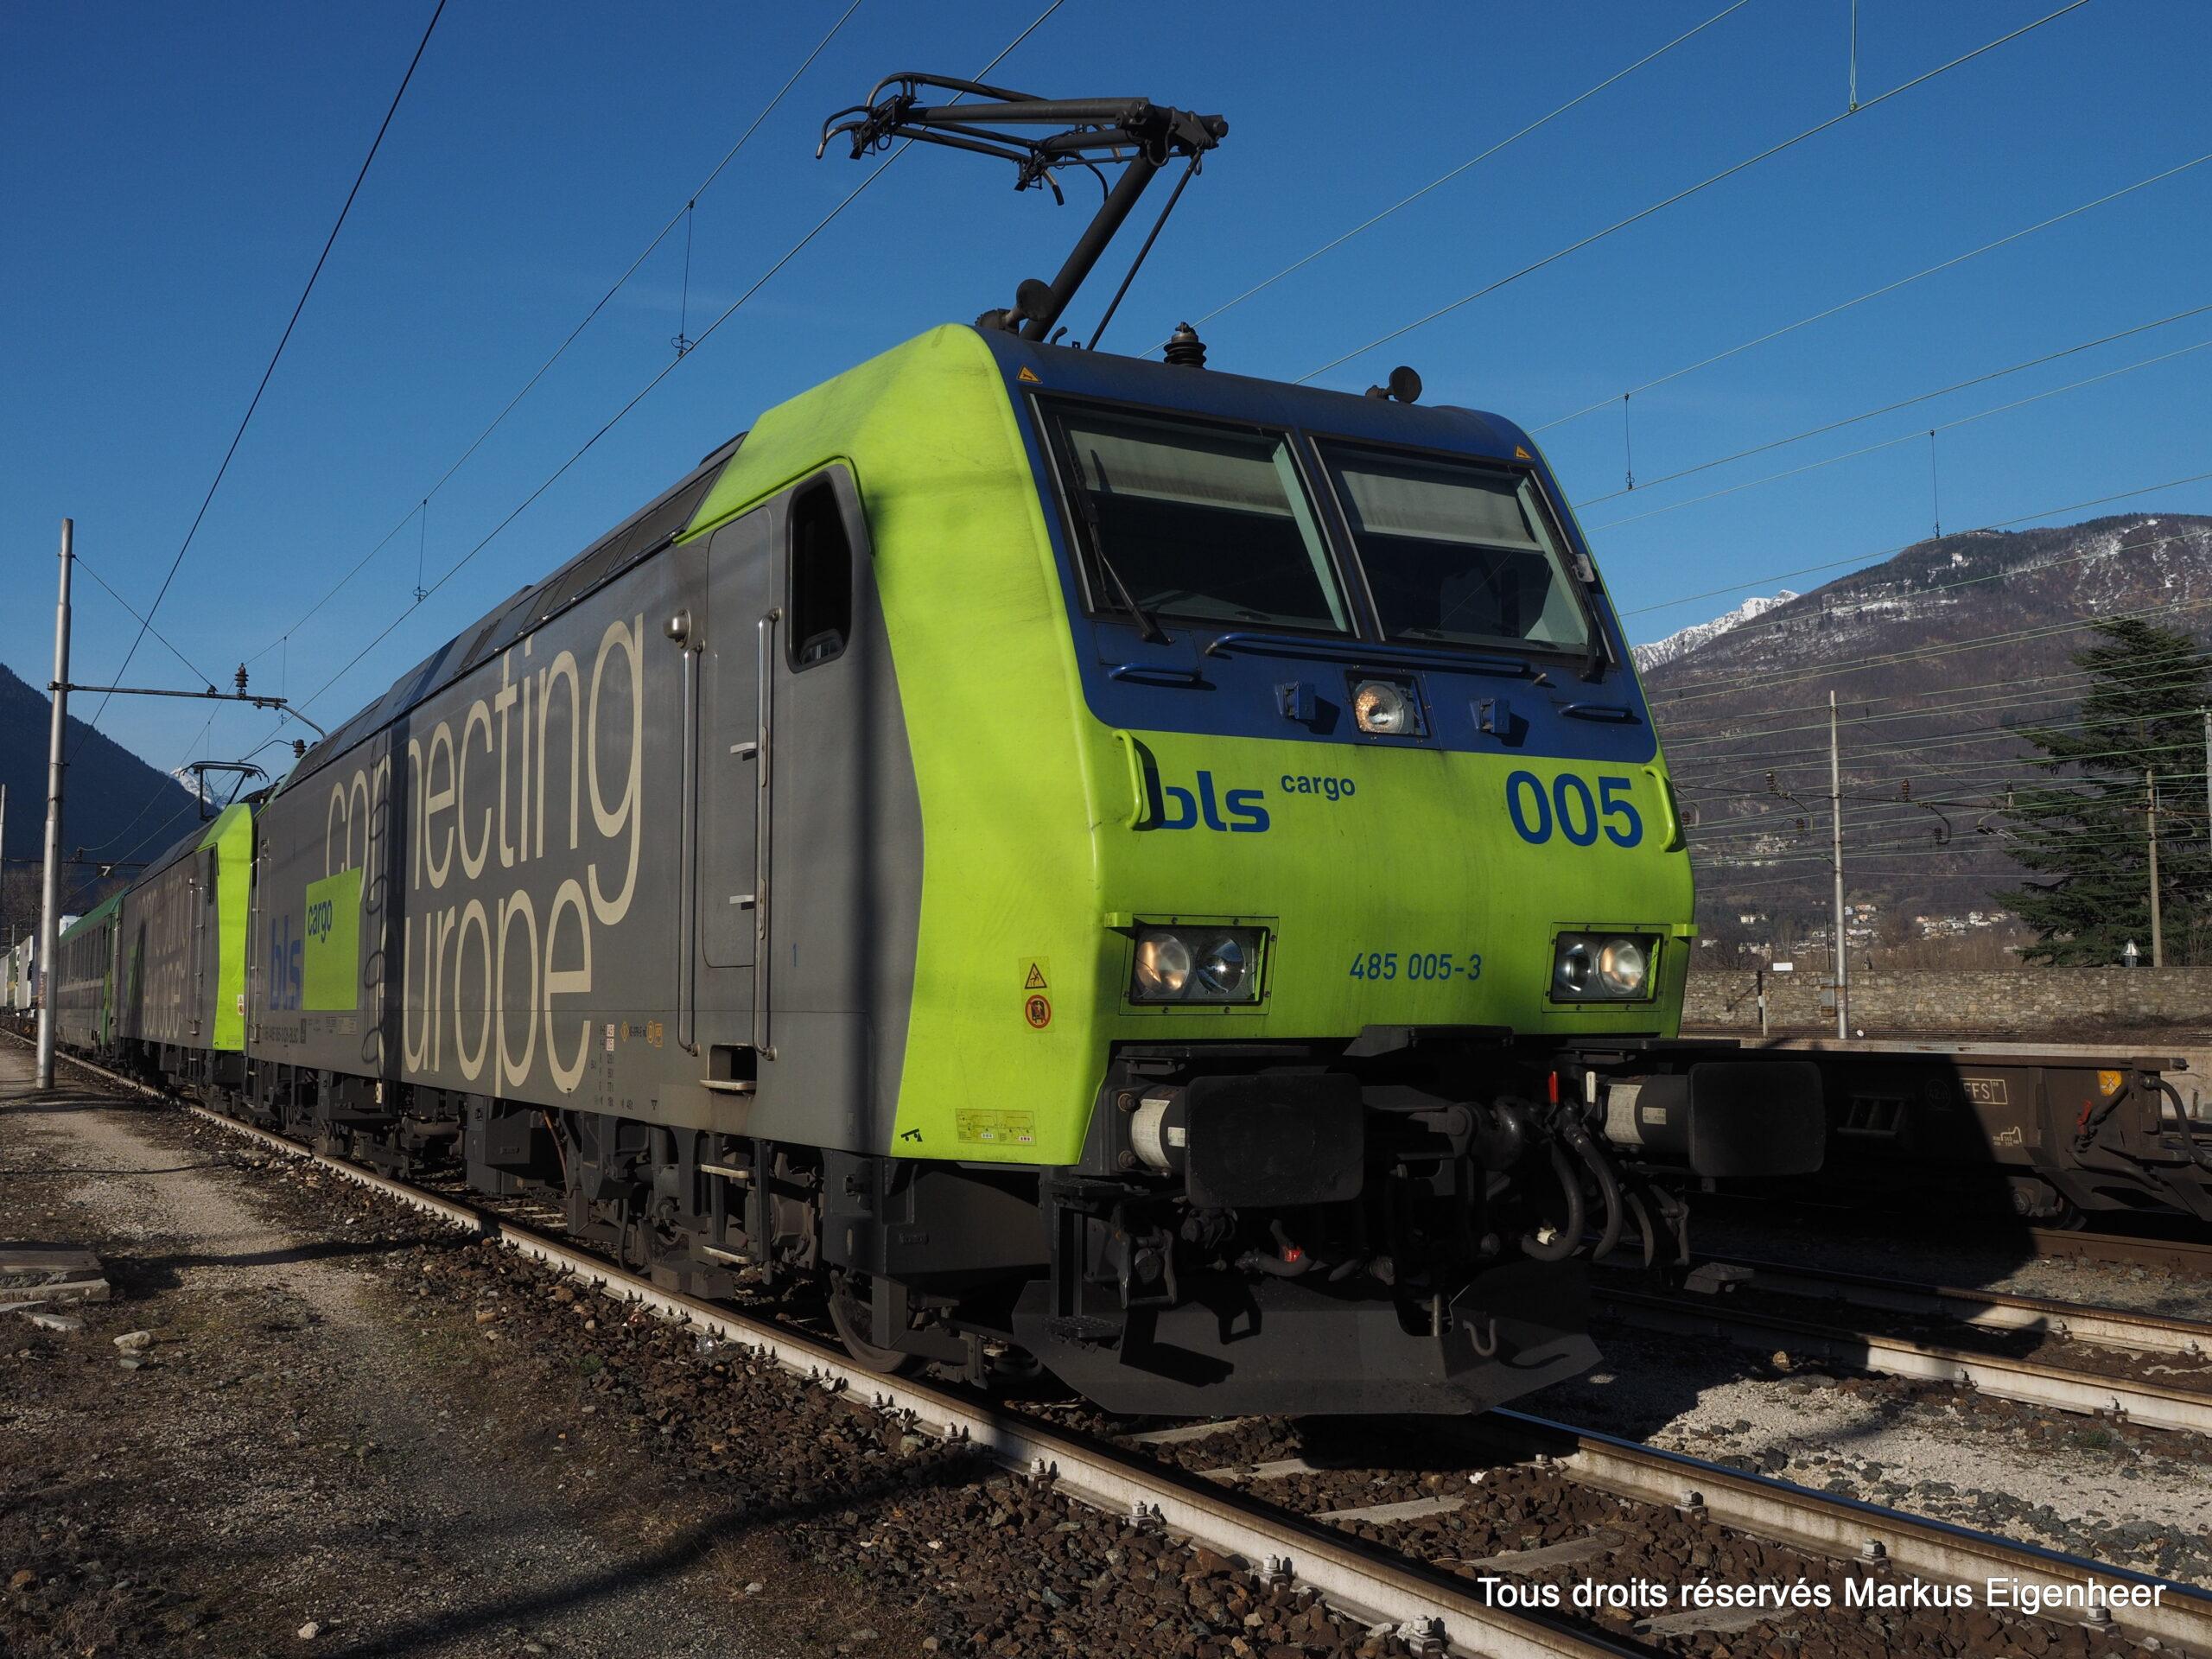 BLS Cargo locomotive